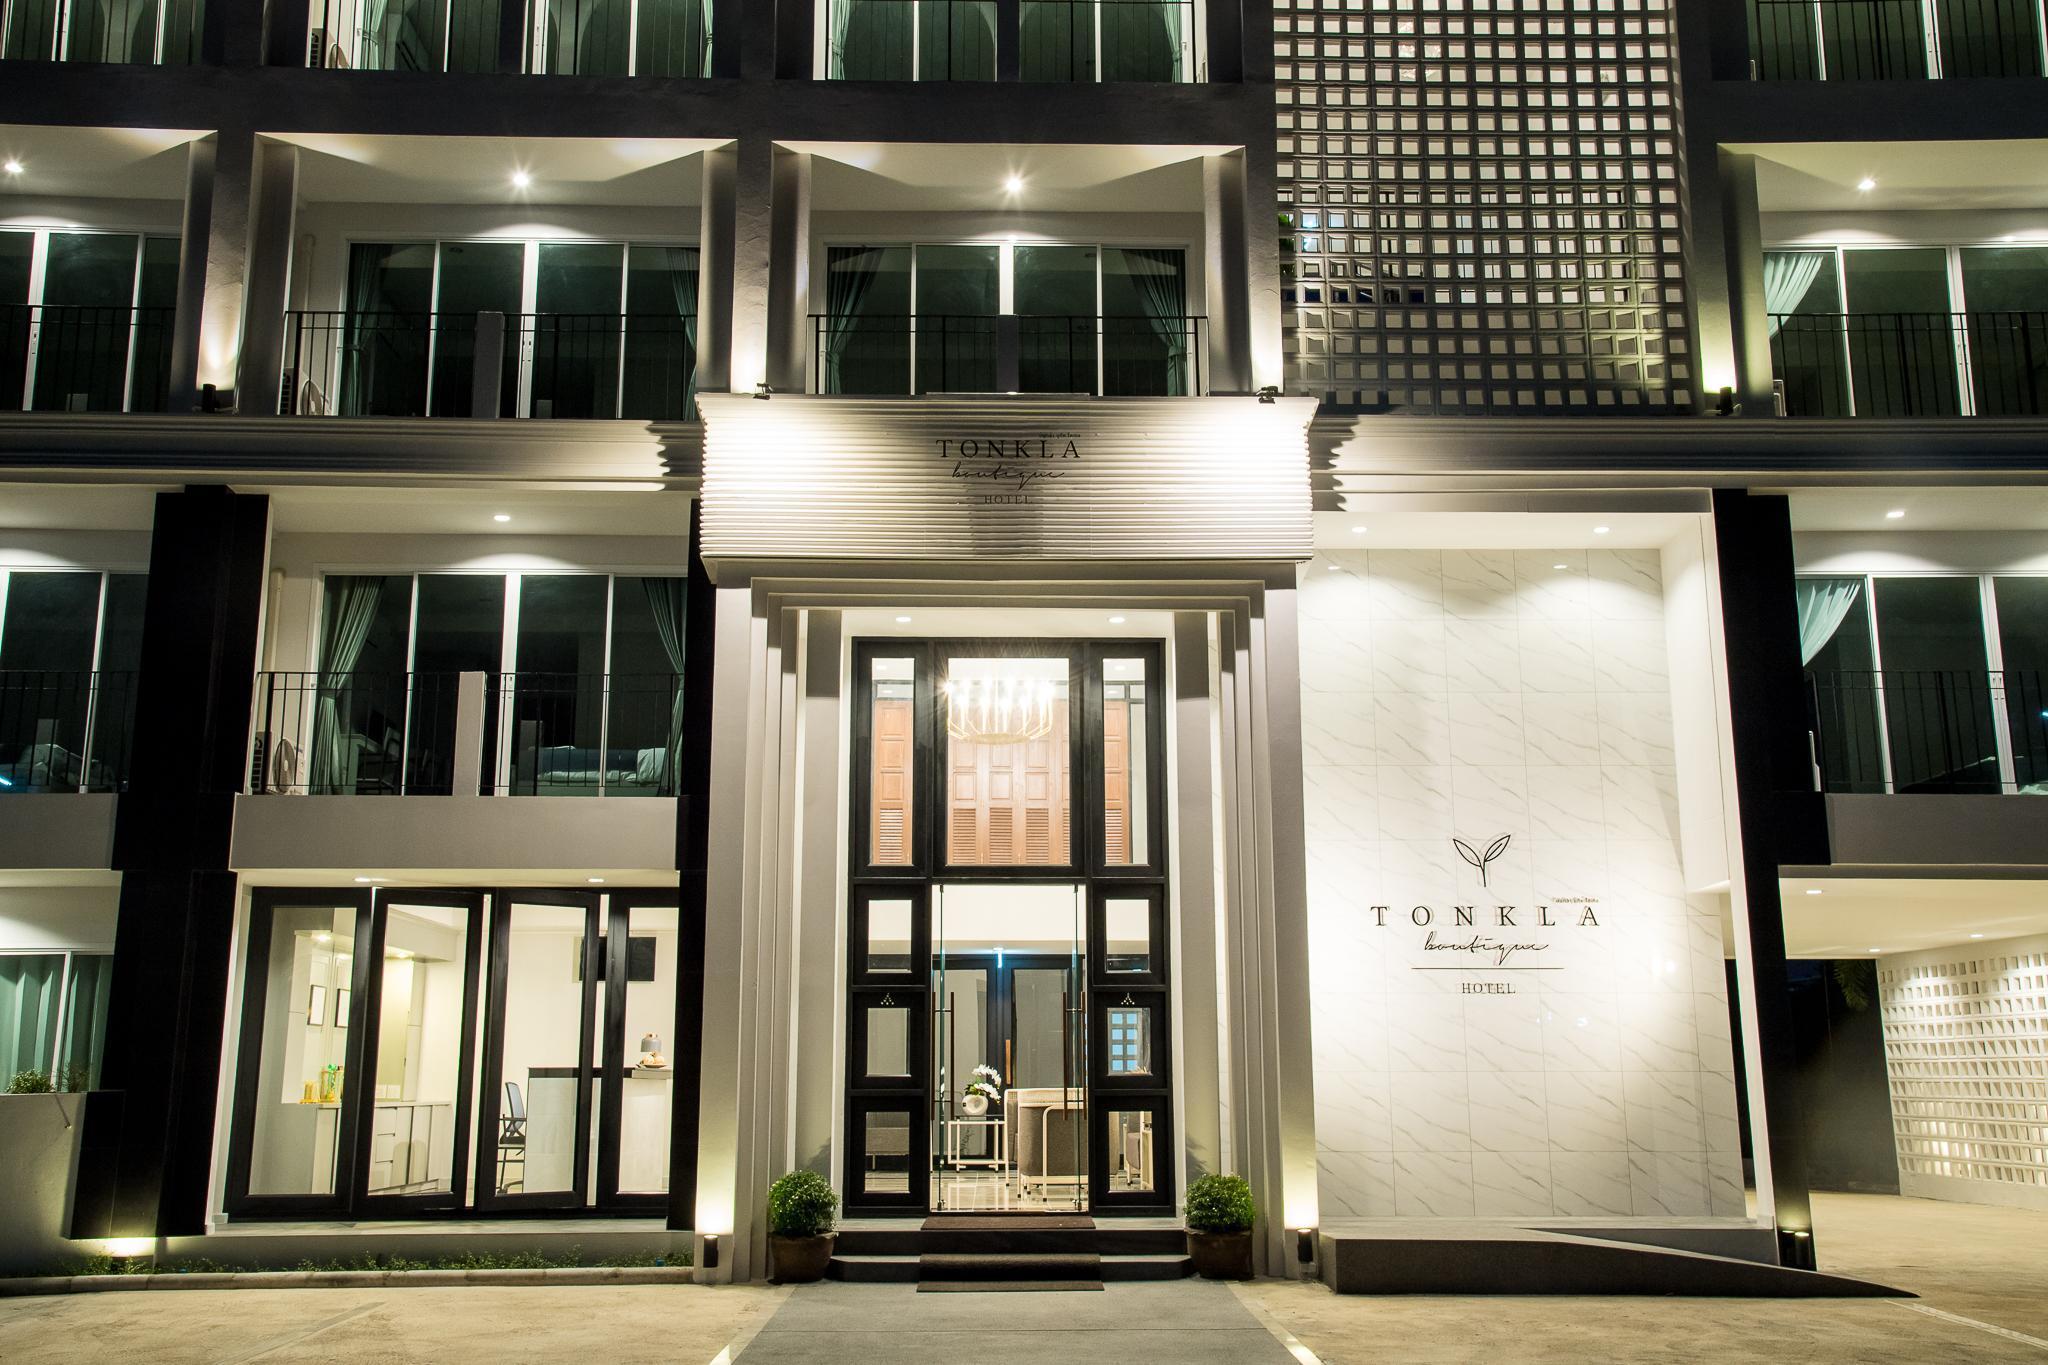 Tonkla Boutique Hotel ต้นกล้า บูทิก โฮเต็ล